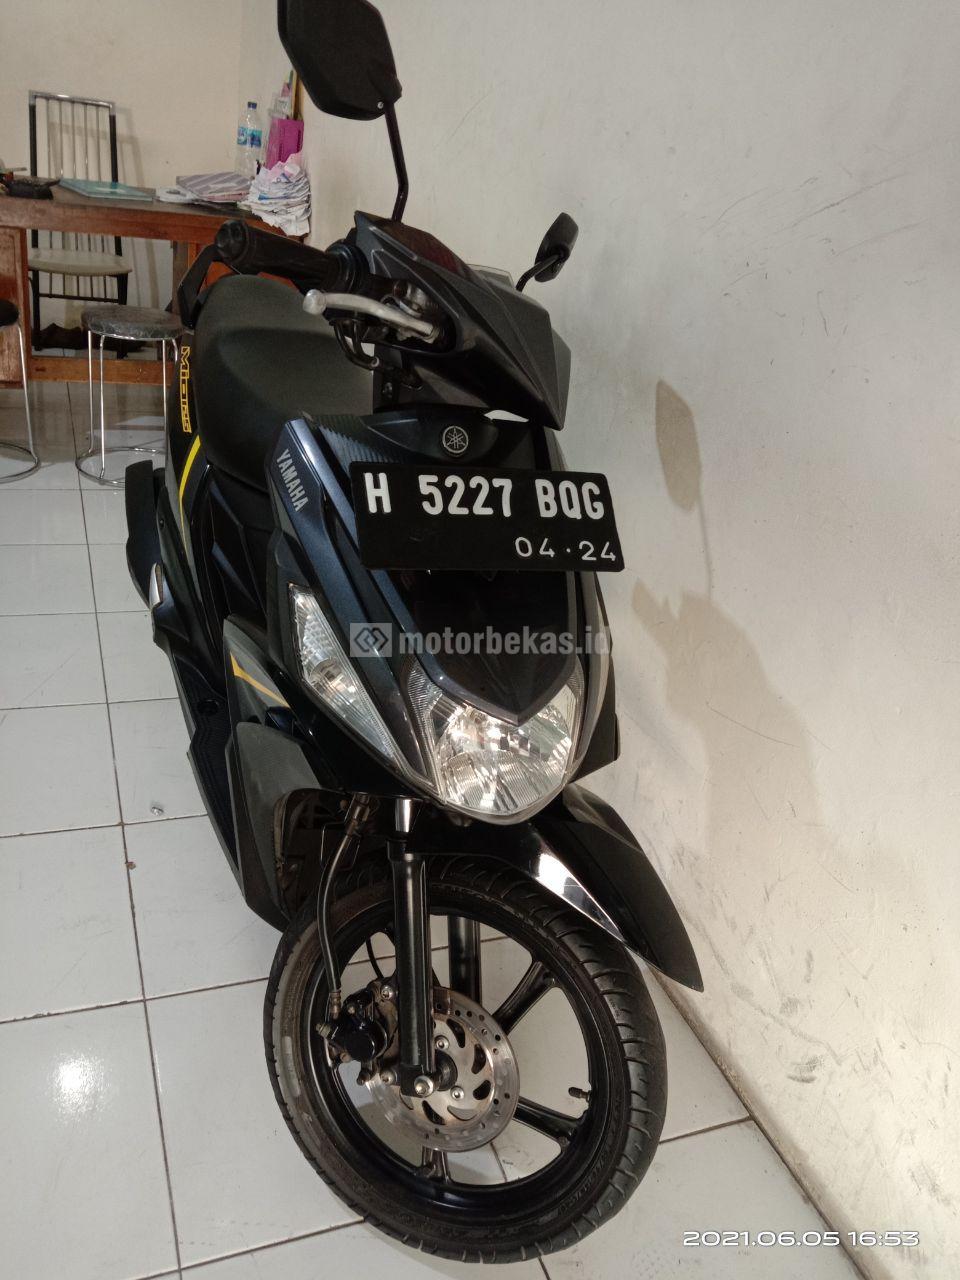 YAMAHA MIO M3 125  2214 motorbekas.id